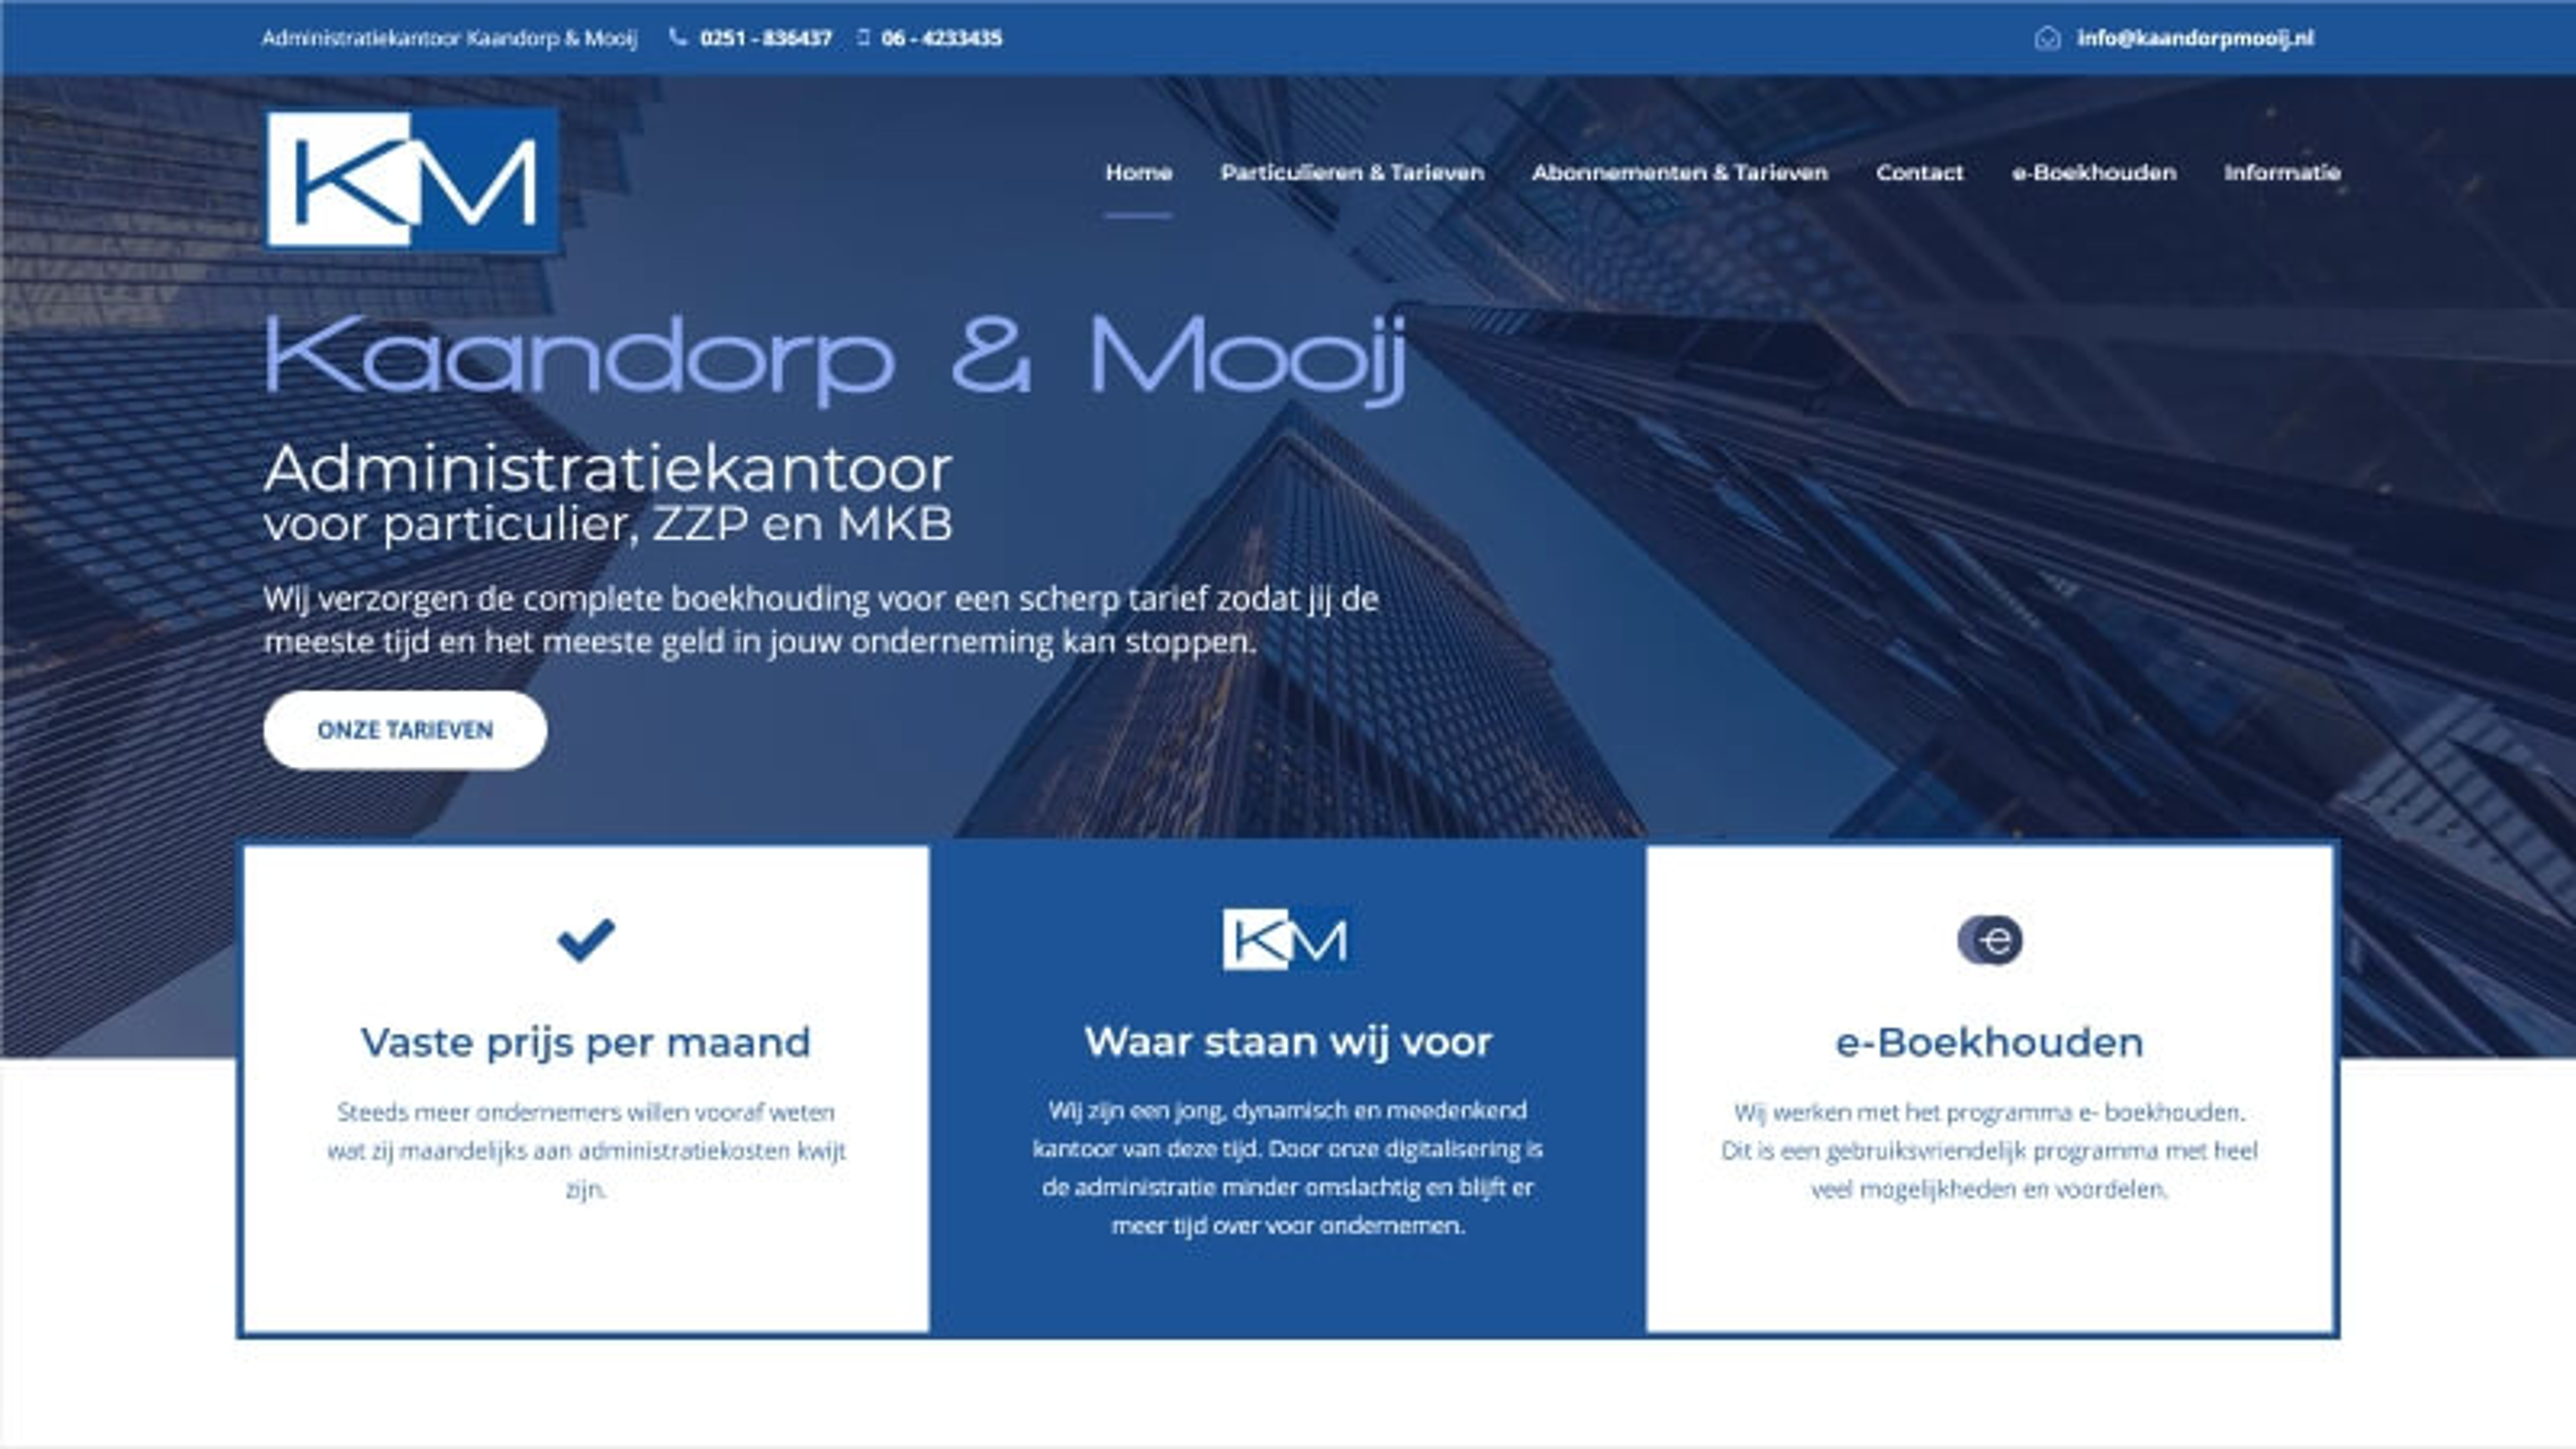 www.kaandorpmooij.nl